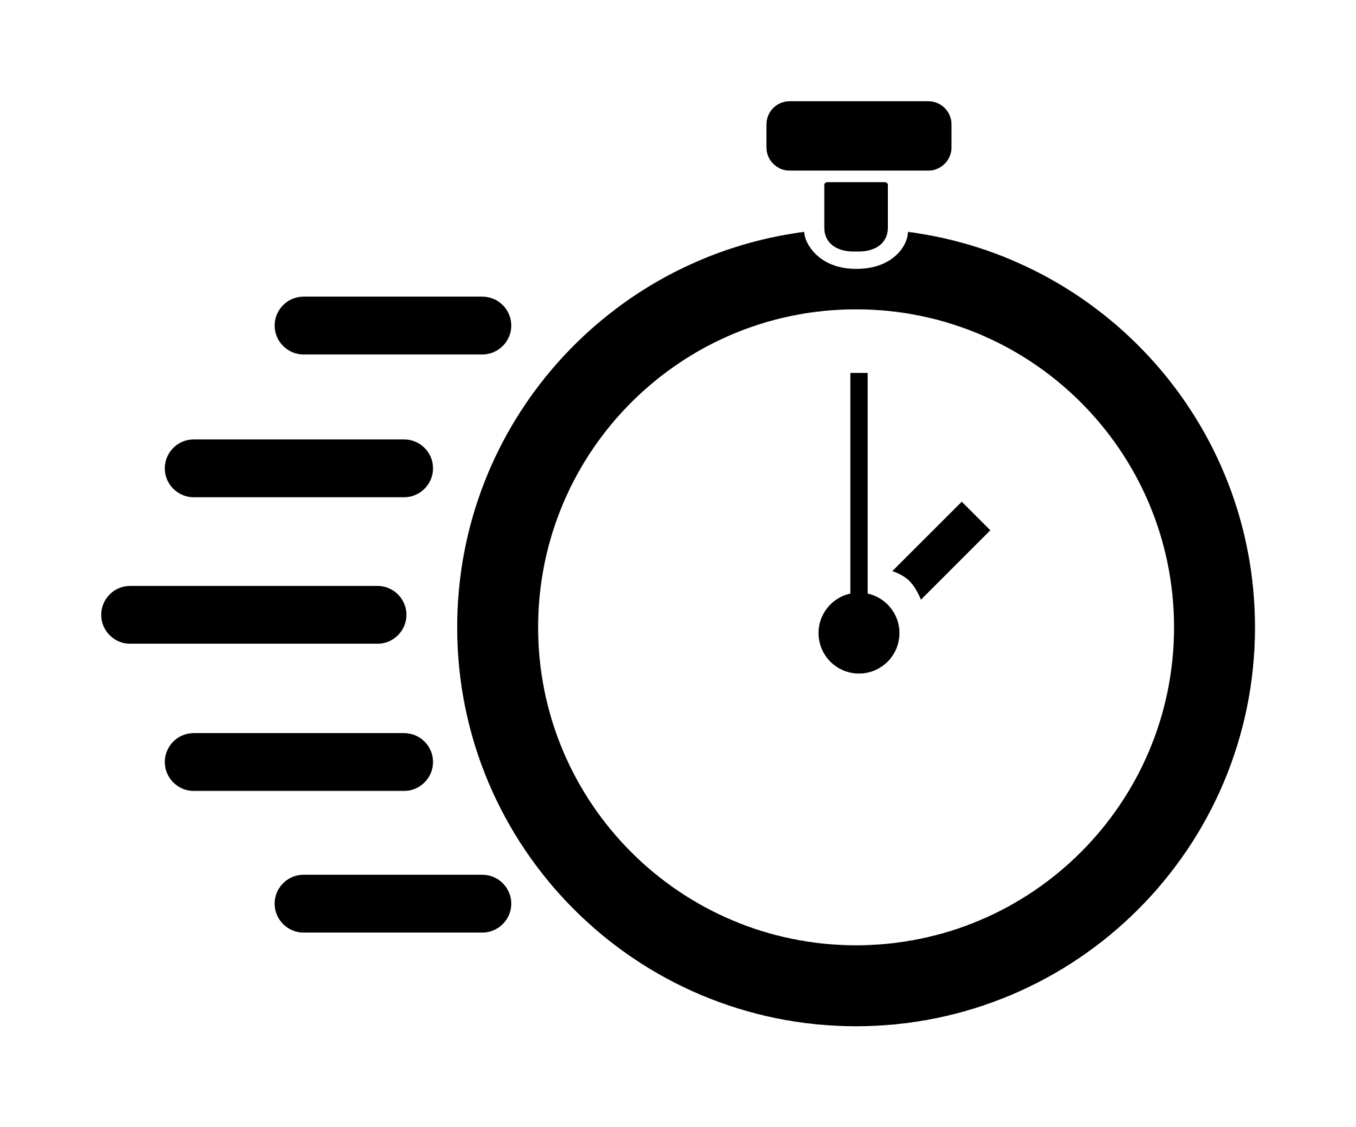 Stopwatch clipart rapid, Stopwatch rapid Transparent FREE.